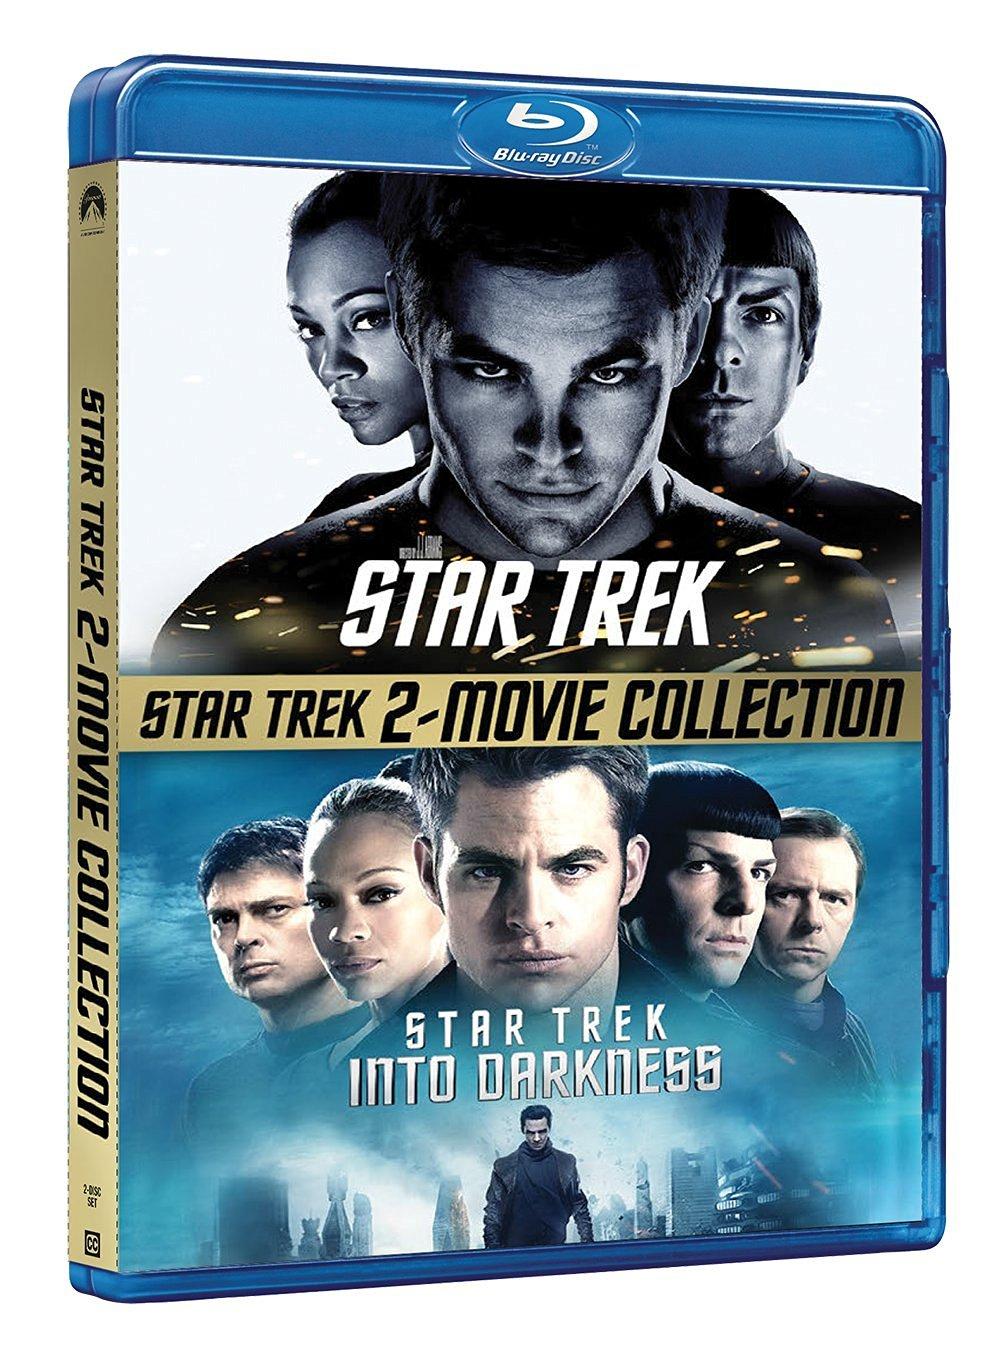 COF.STAR TREK (2009) + INTO DARKNESS - STAR TREK (2 BLU-RAY)